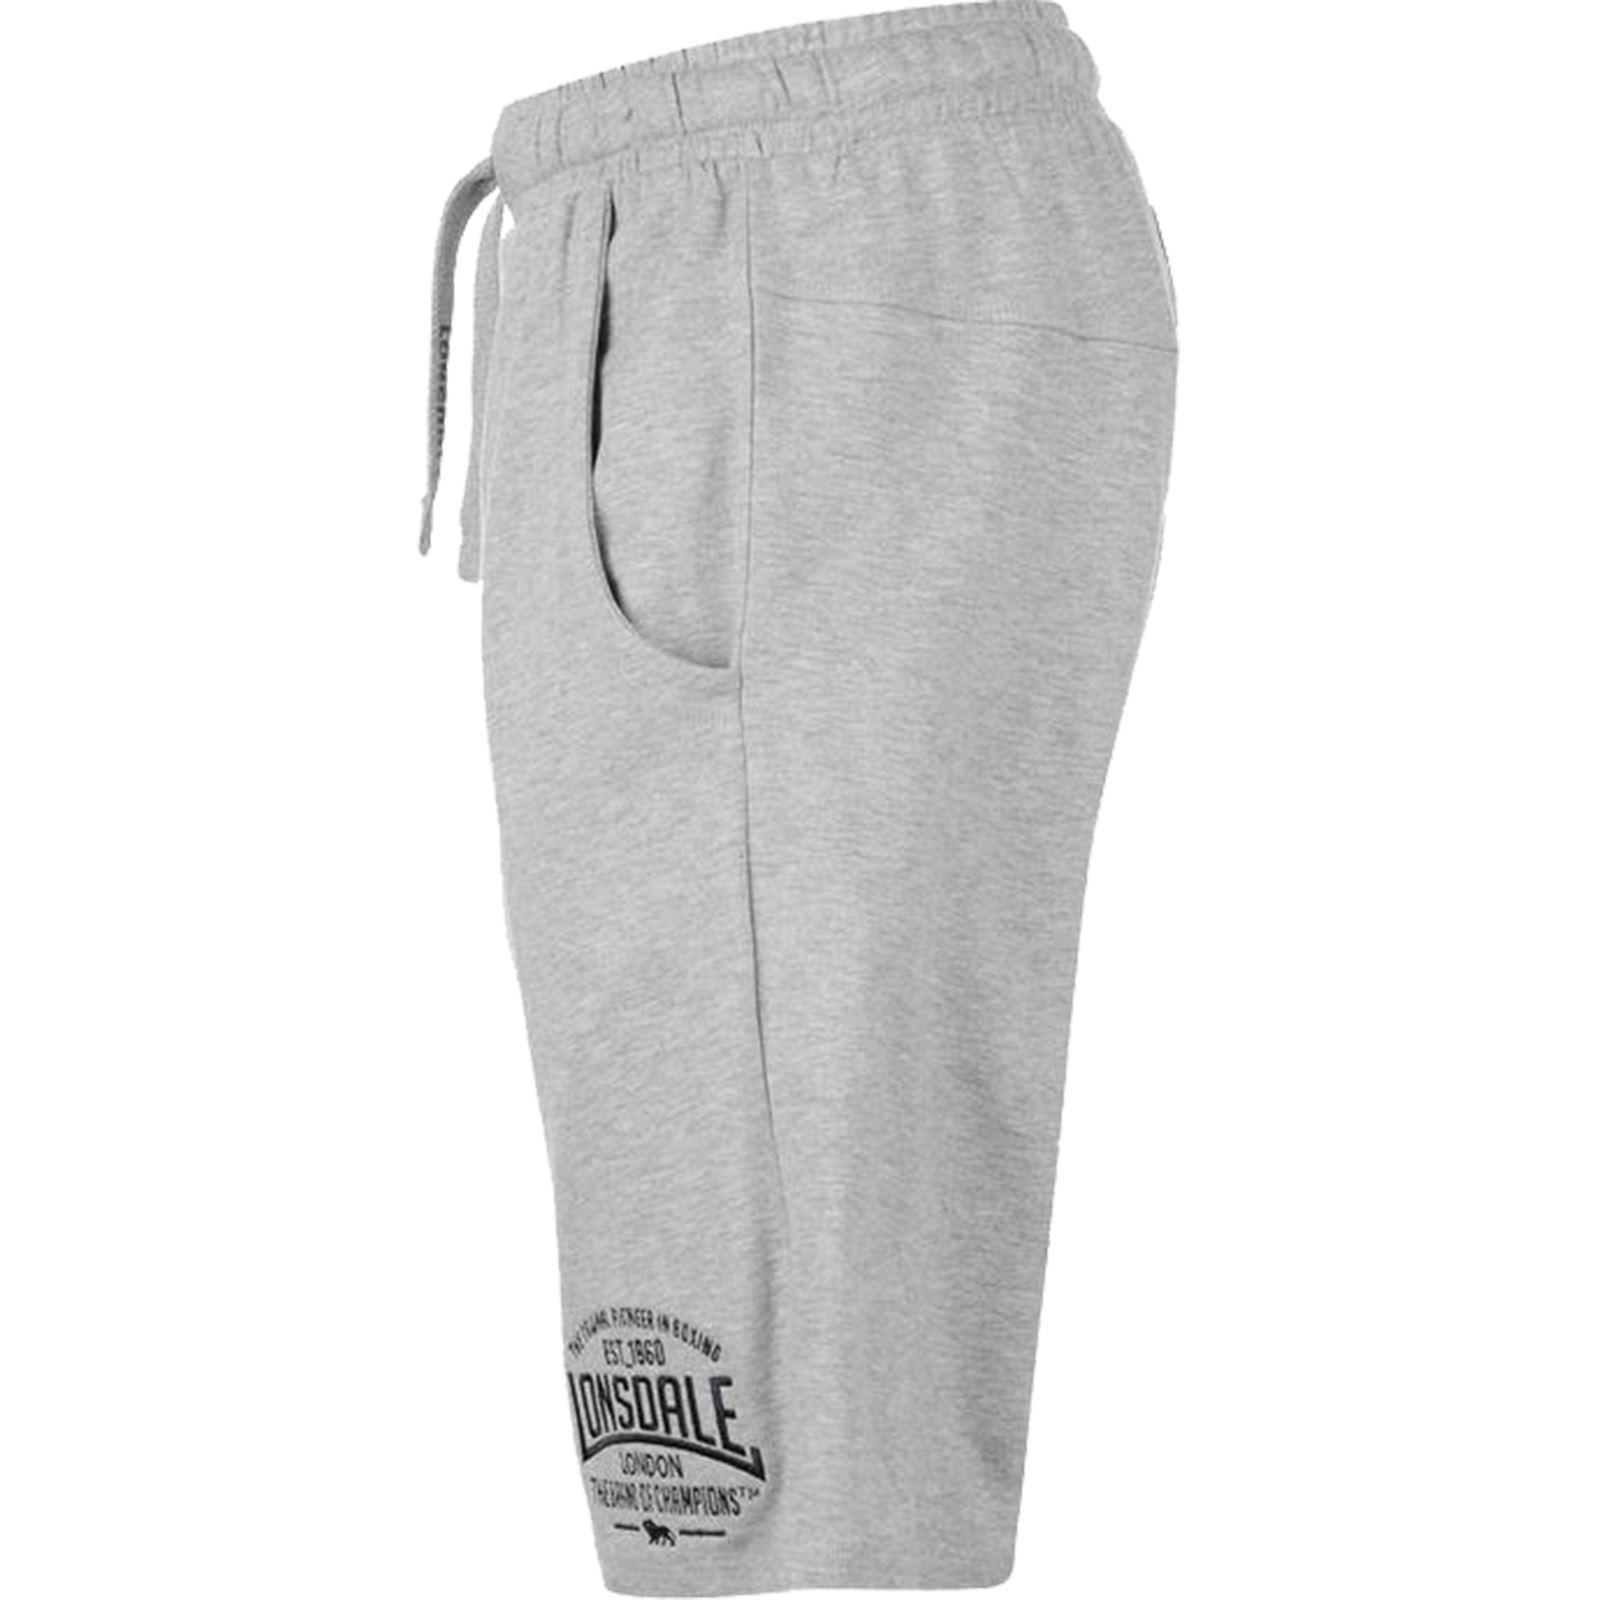 Mens Lonsdale Everlast Gym Fleece Jogger Gym Shorts Elasticated Waist Running